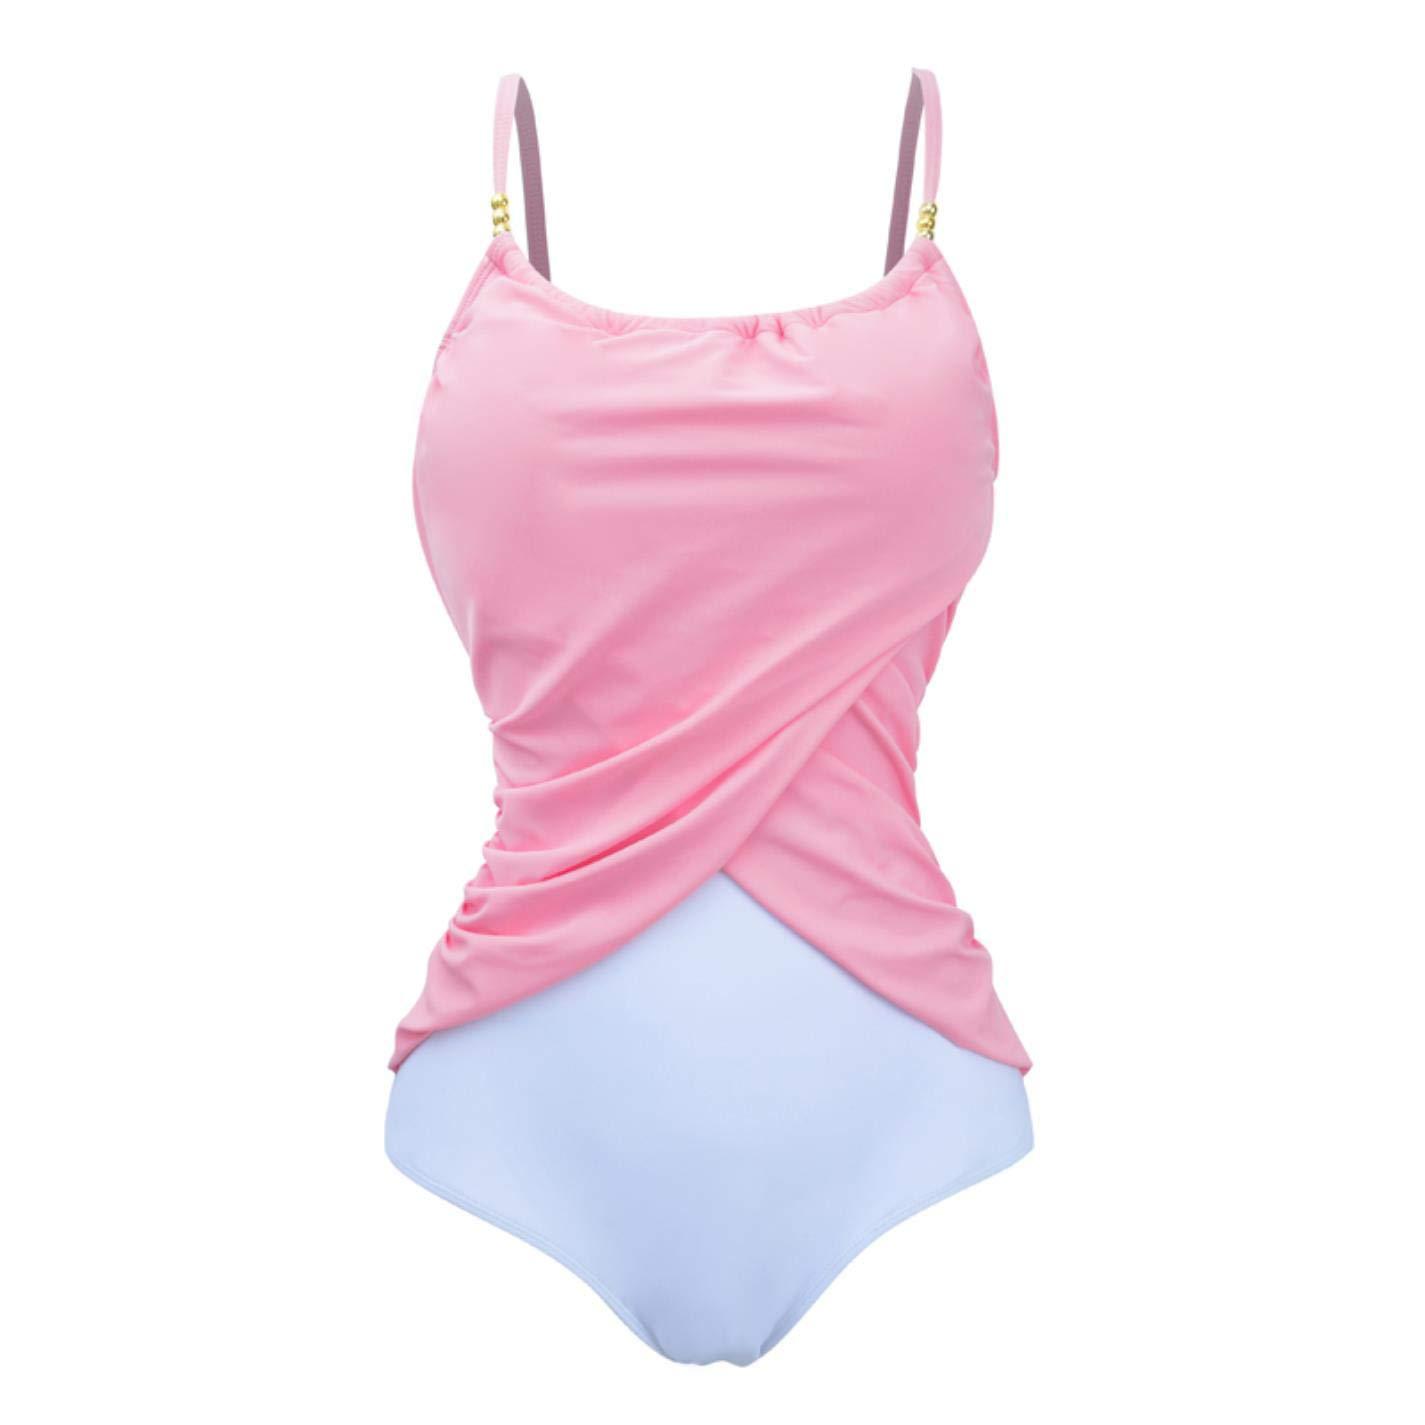 QVKis Women One Piece Swimsuit High Neck Plus Size Push up Swimwear